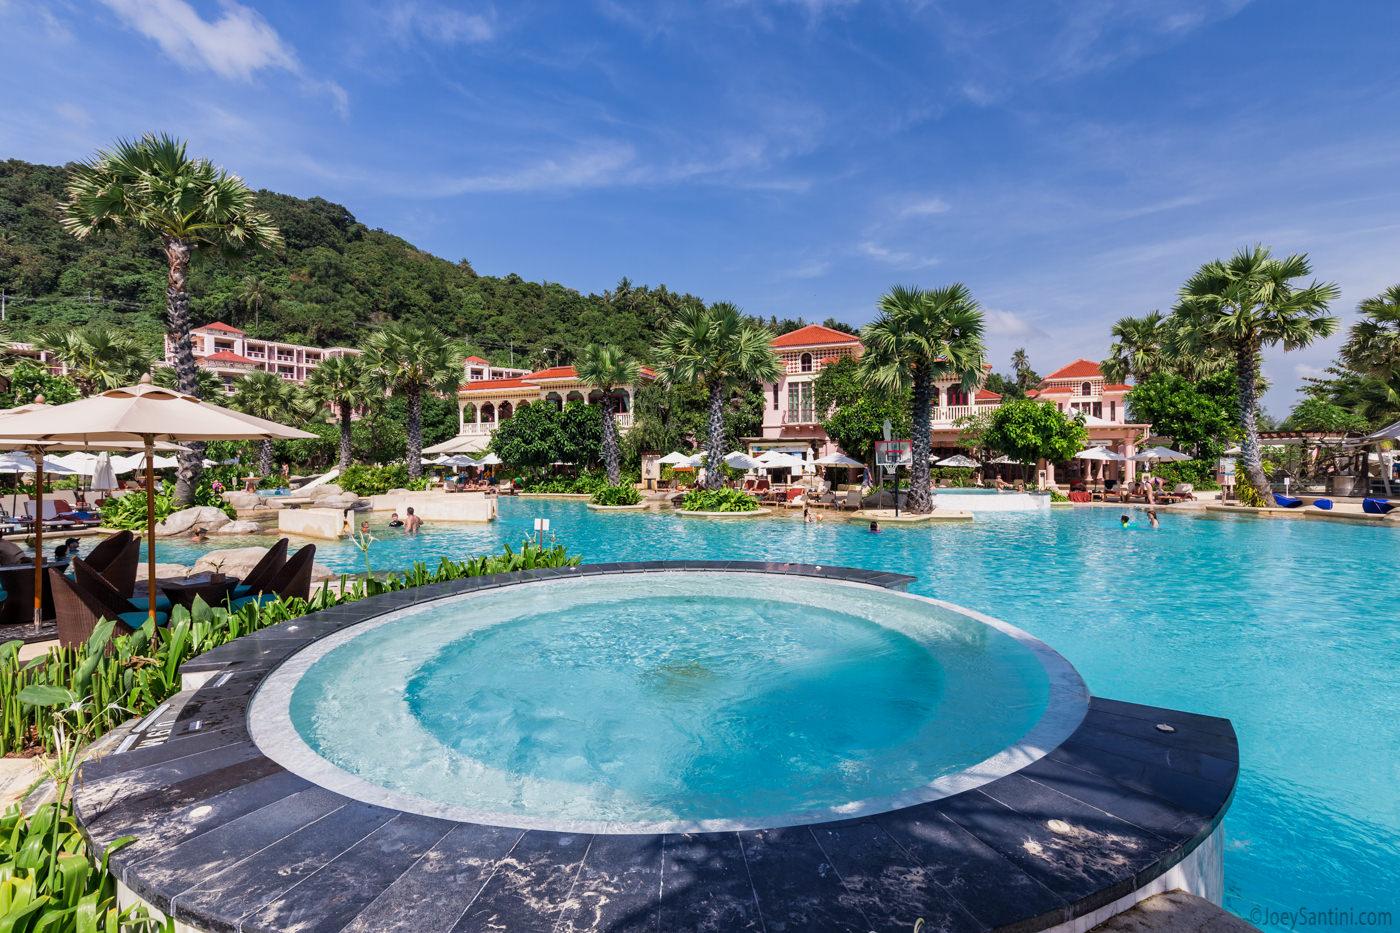 centara grand beach resort phuket joey santini photography. Black Bedroom Furniture Sets. Home Design Ideas